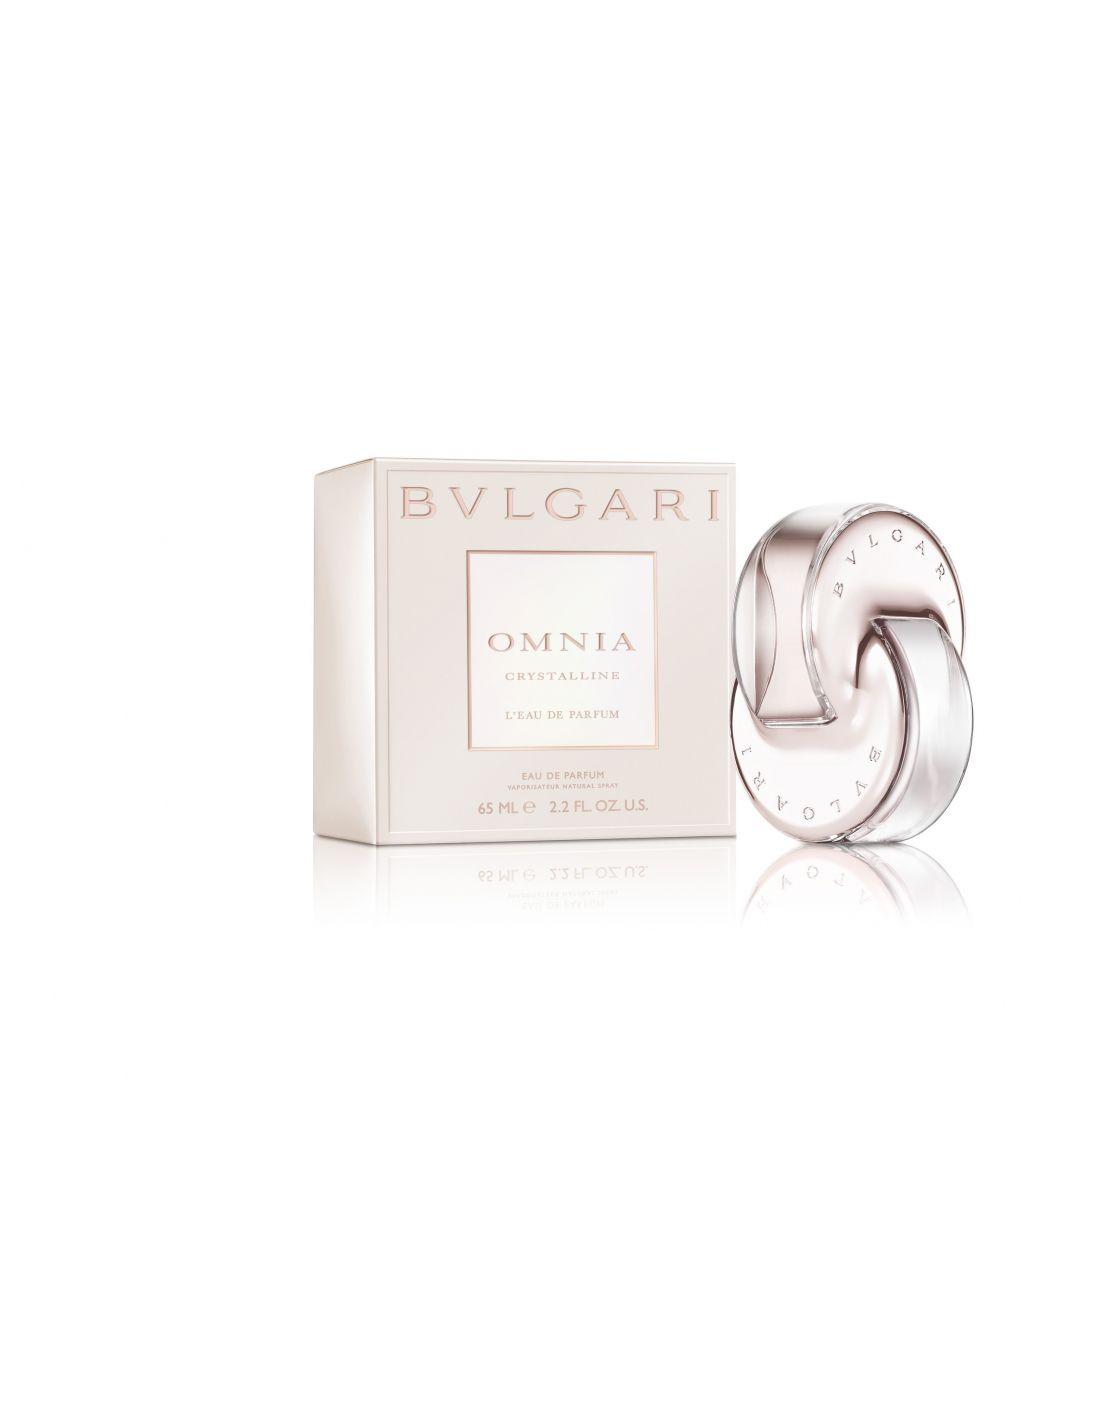 Perfume Omnia Crystalline L Eau Eau de Parfum 65 ml - Perfumes 24 ® a34bee76b9